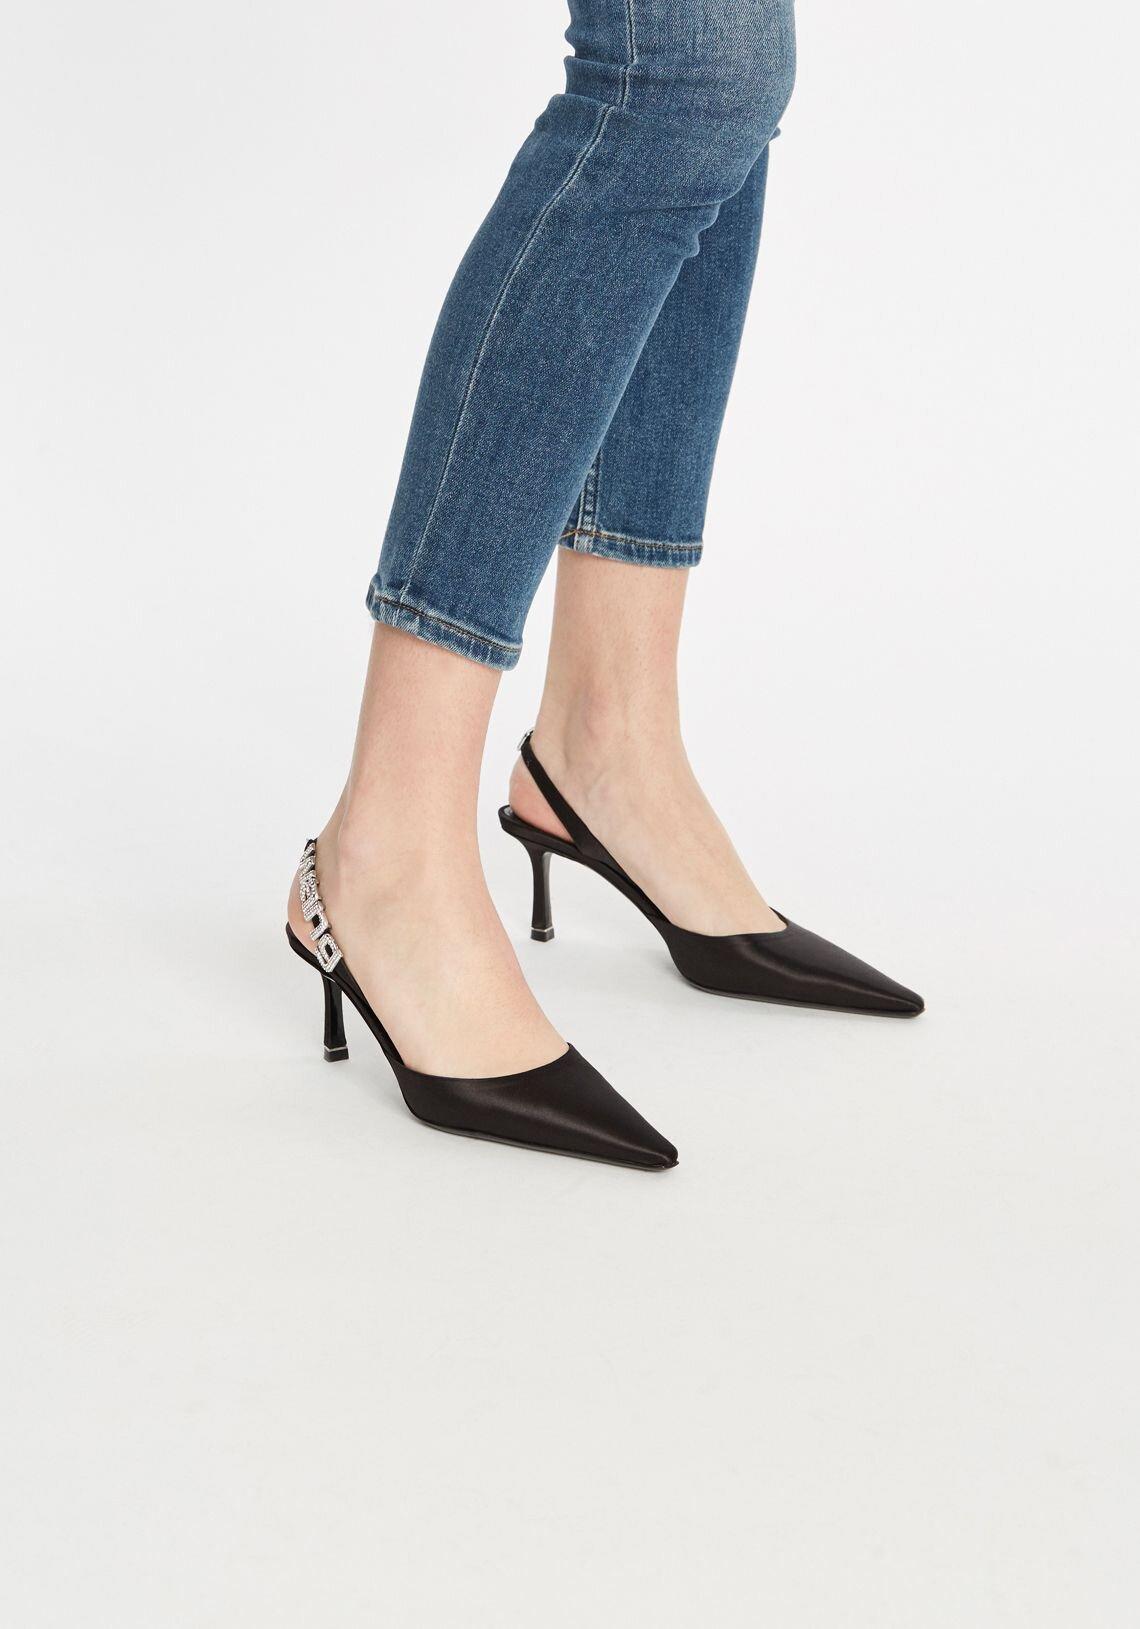 grace-satin-heel-black-alexander-wang--tuchuzy1.jpg